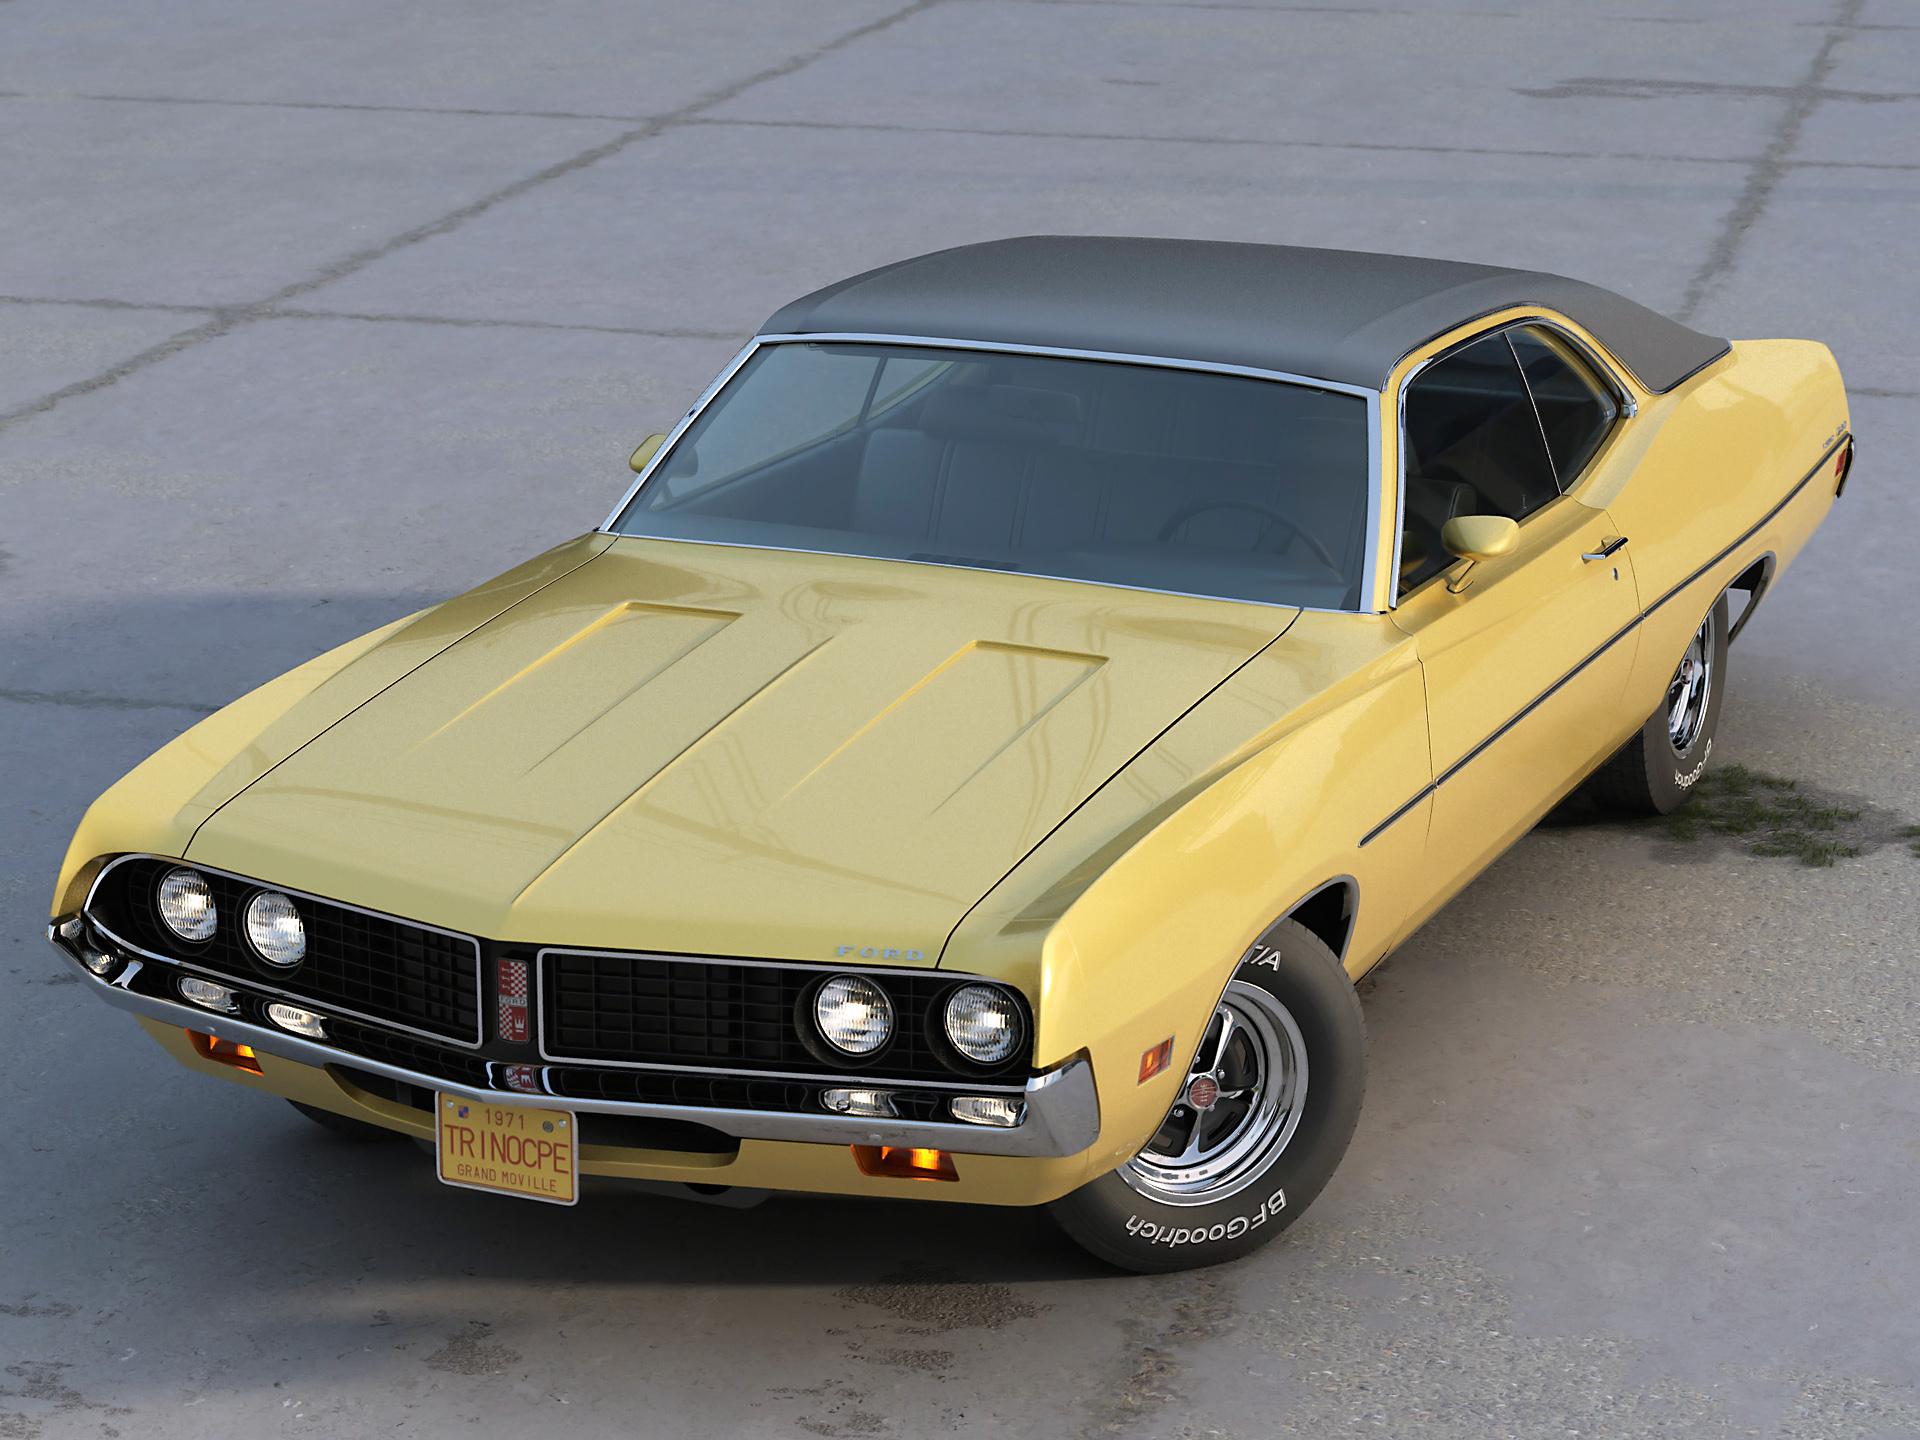 Torino Coupe 1971 3d model max fbx c4d obj 273811